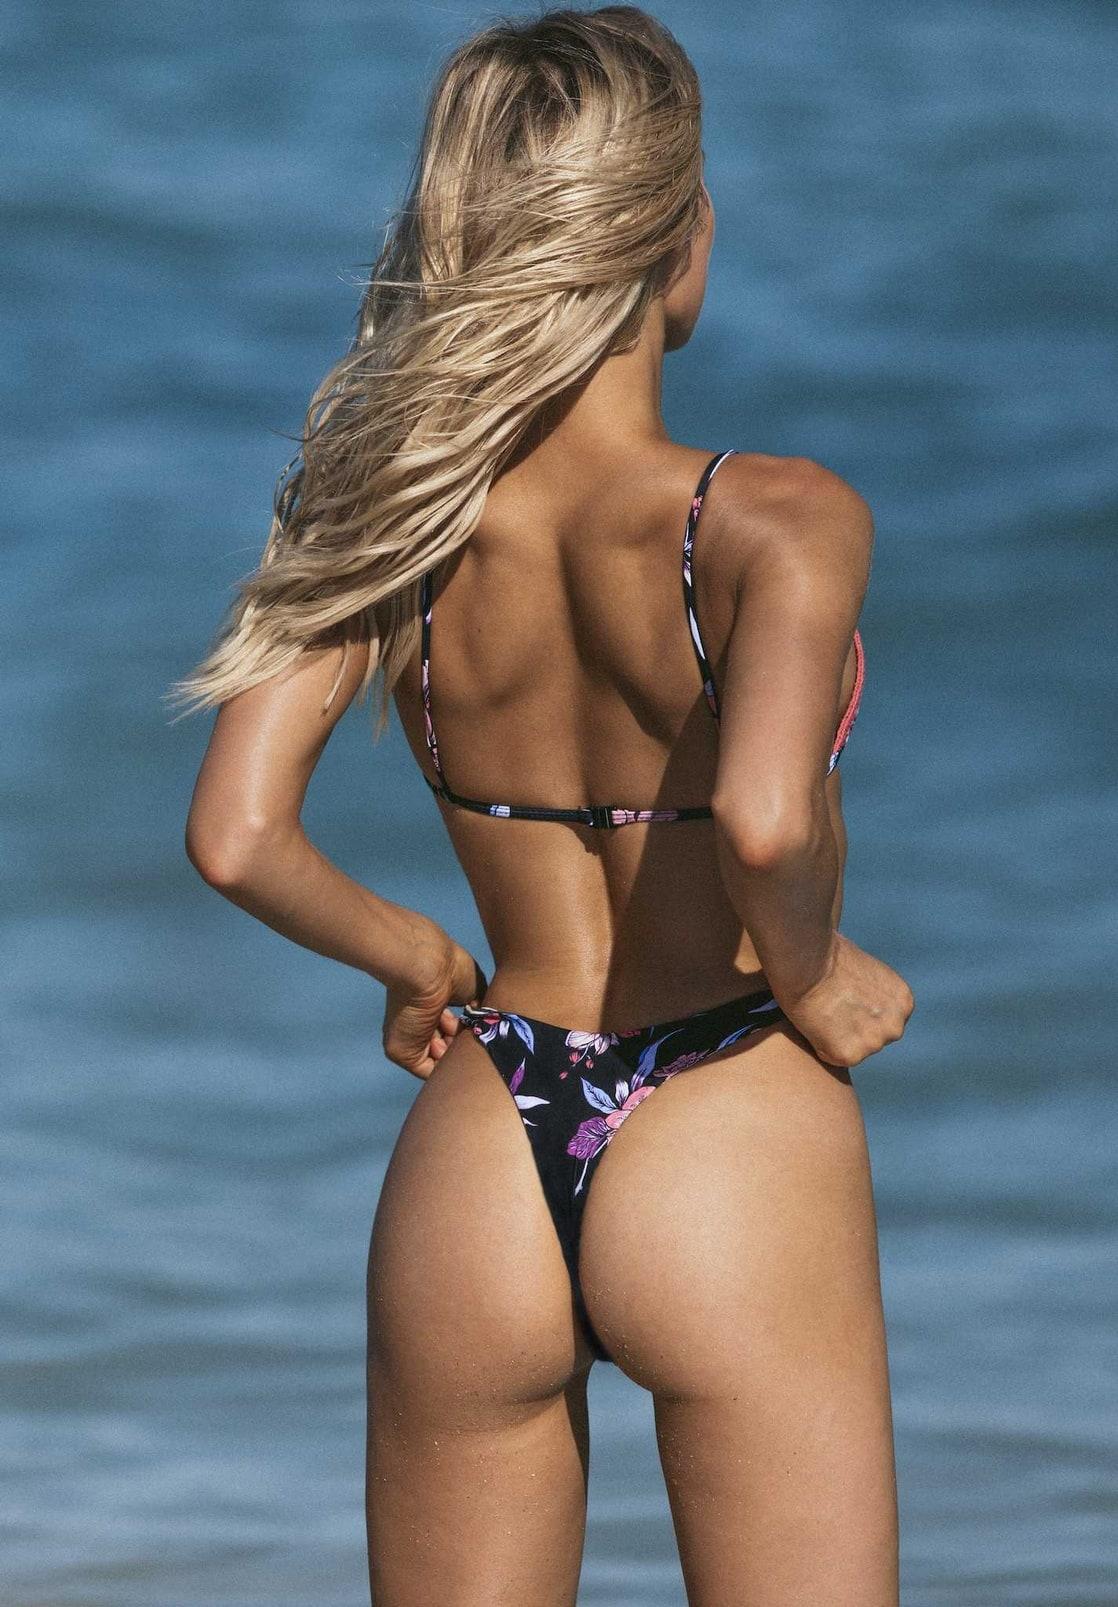 butt Ass Joy Corrigan naked photo 2017